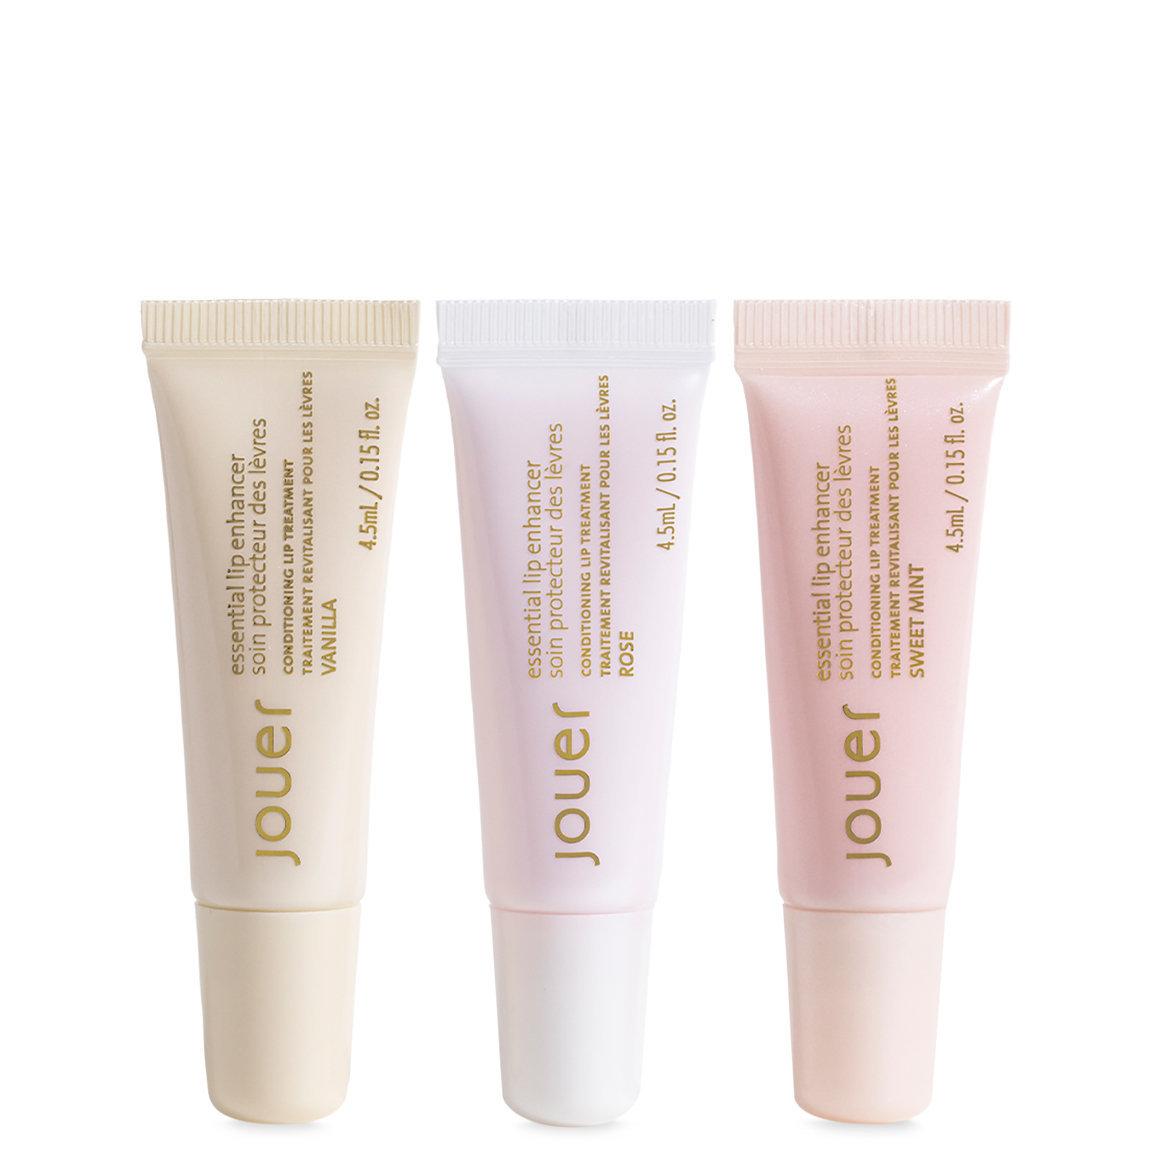 Jouer Cosmetics Essential Lip Enhancer Sweet Deluxe Trio alternative view 1 - product swatch.